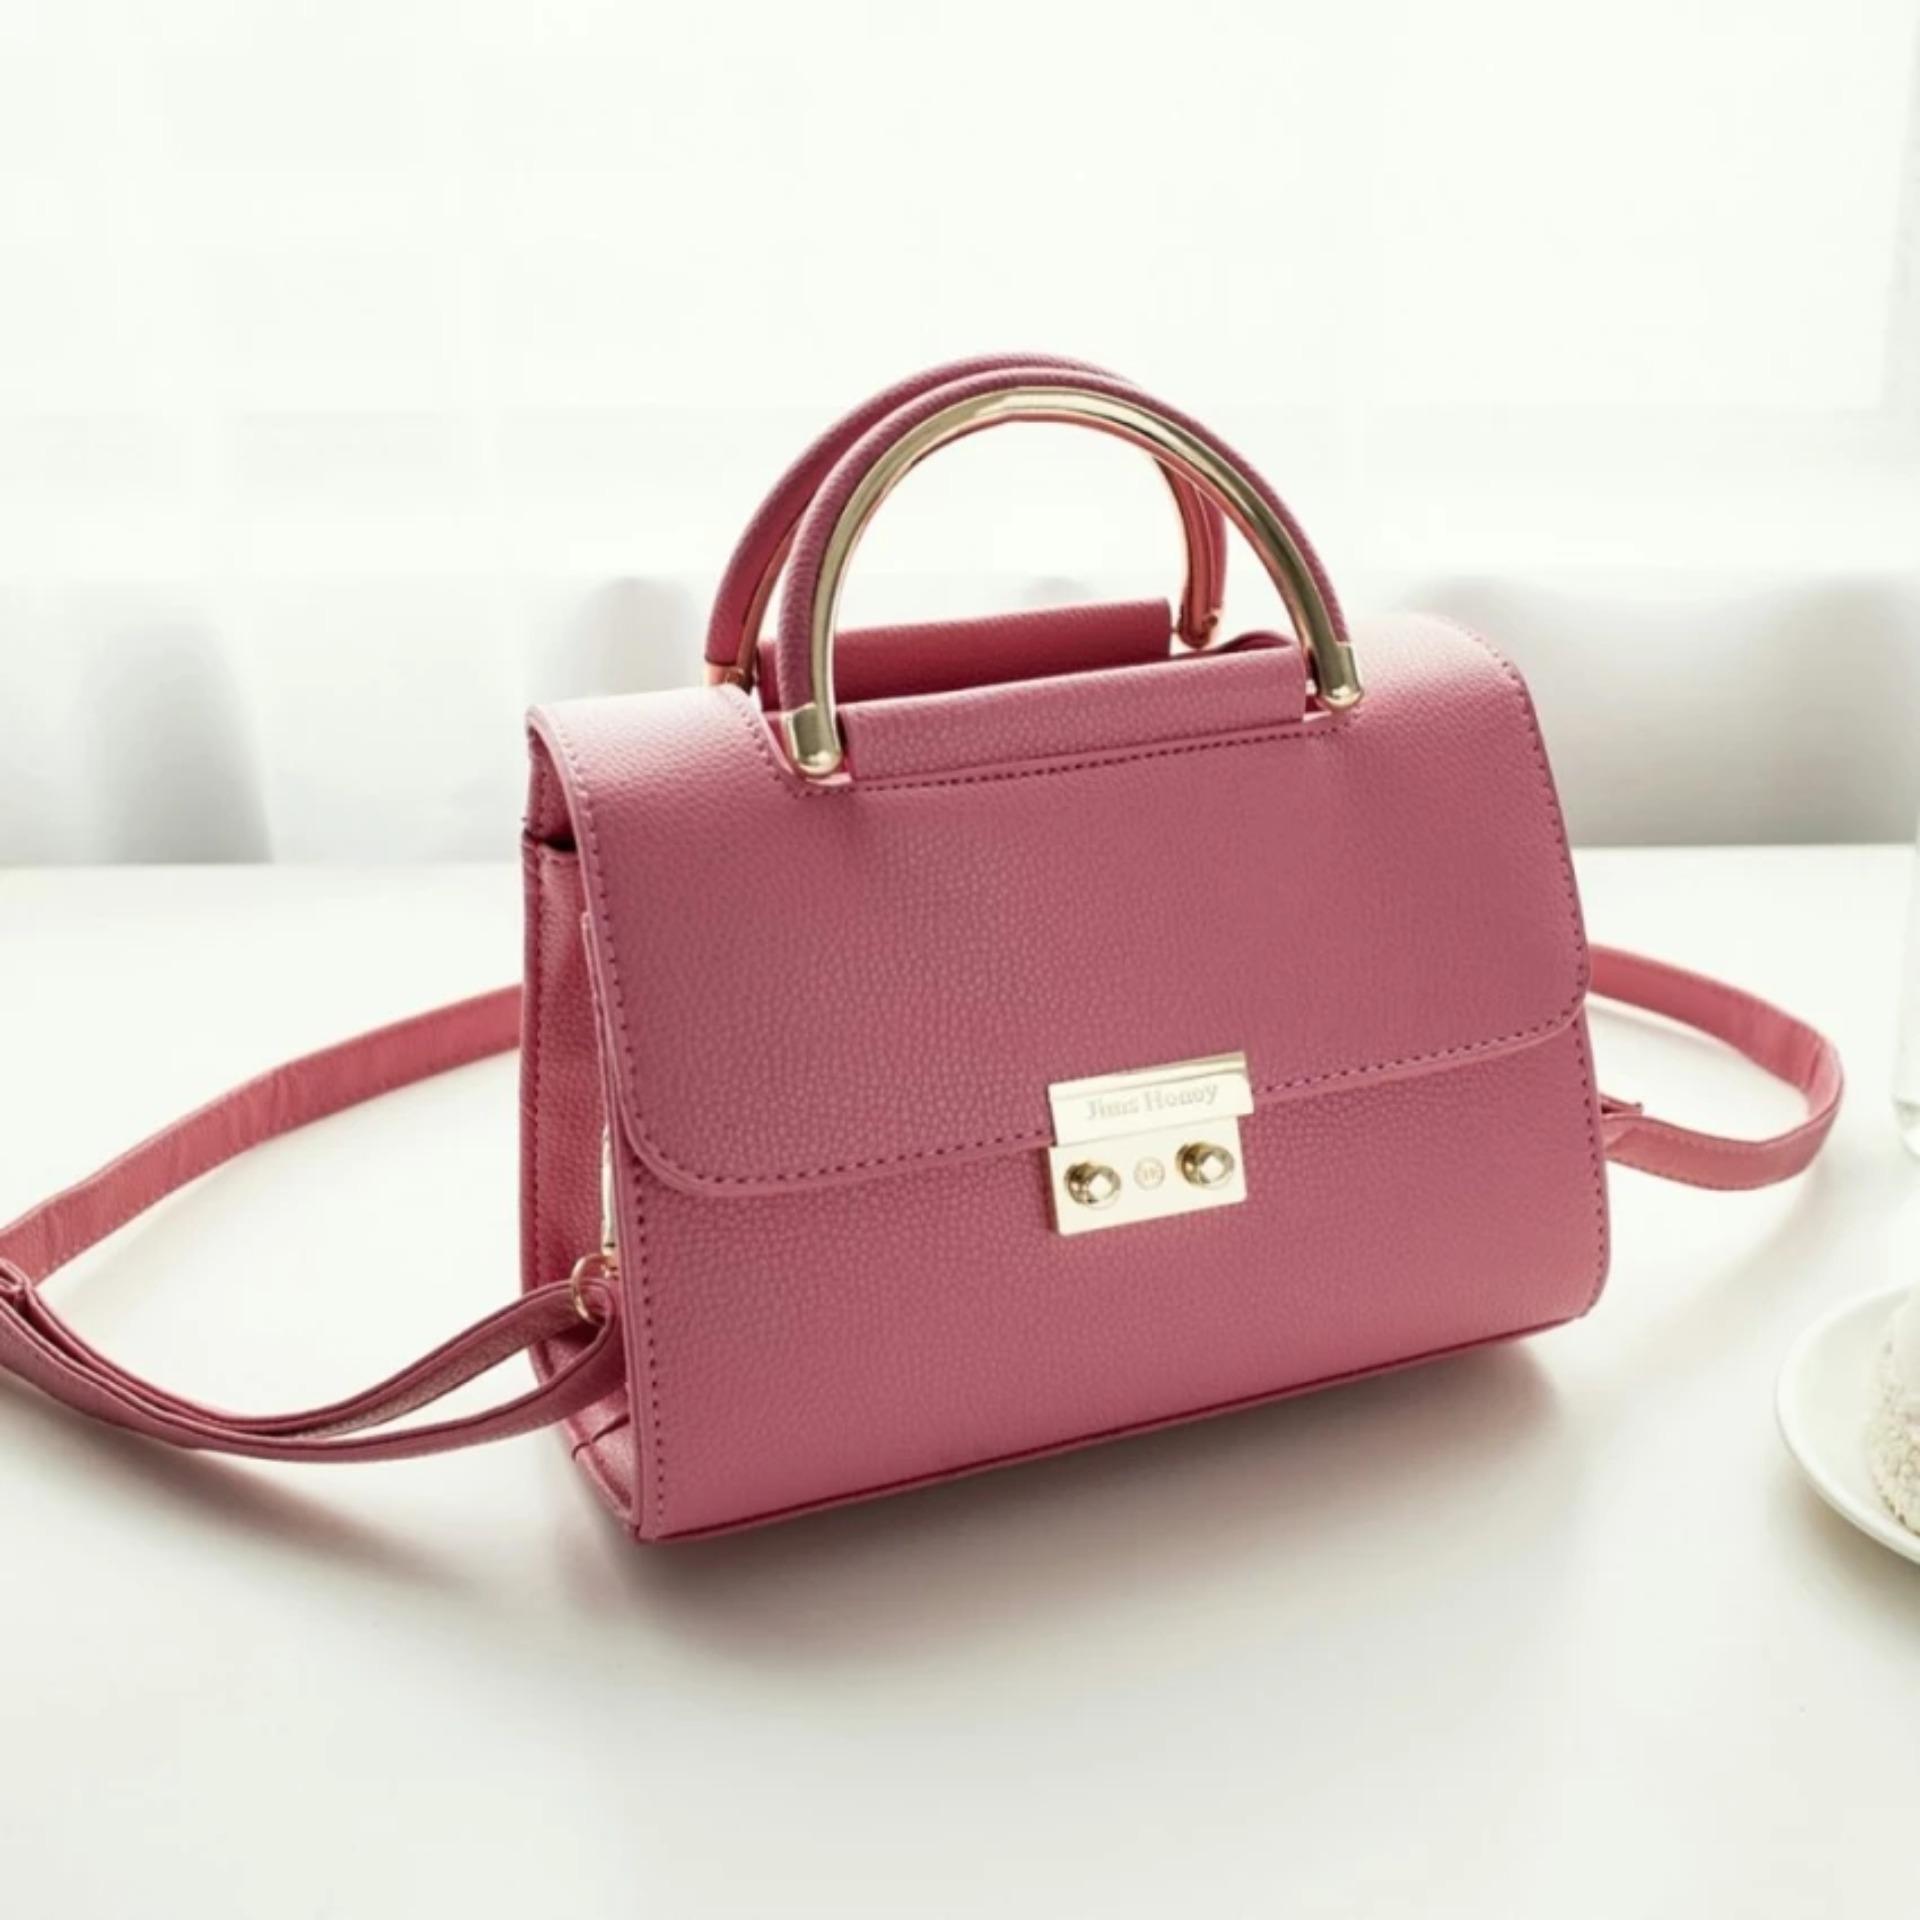 Harga Tas Selempang Wanita Jimshoney Zoey Bag Pink Branded